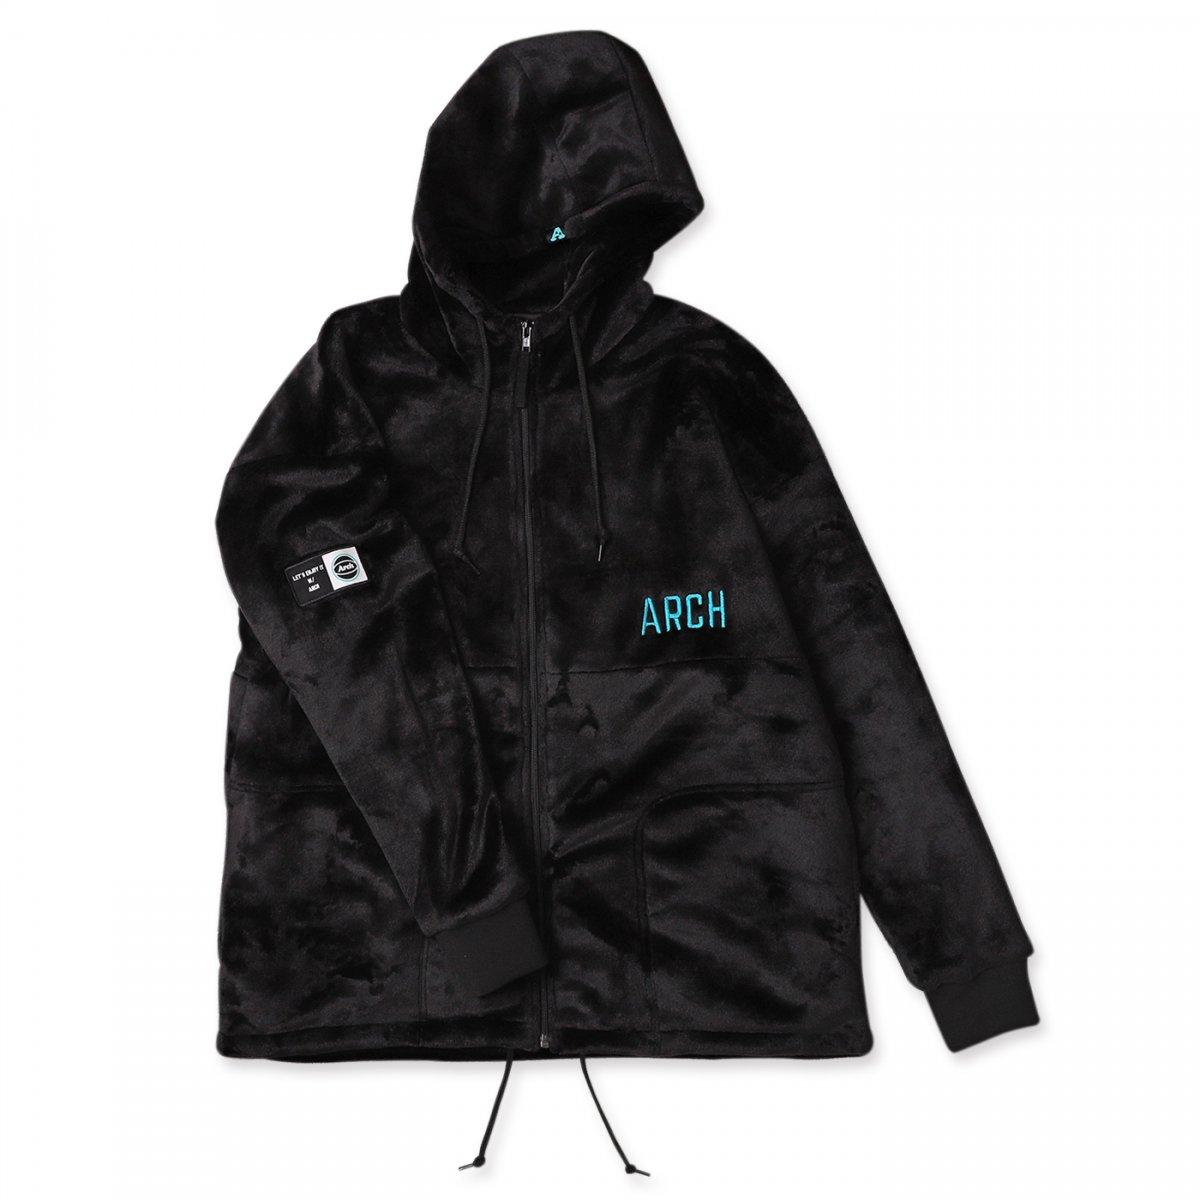 sport fleece jacket 【black】